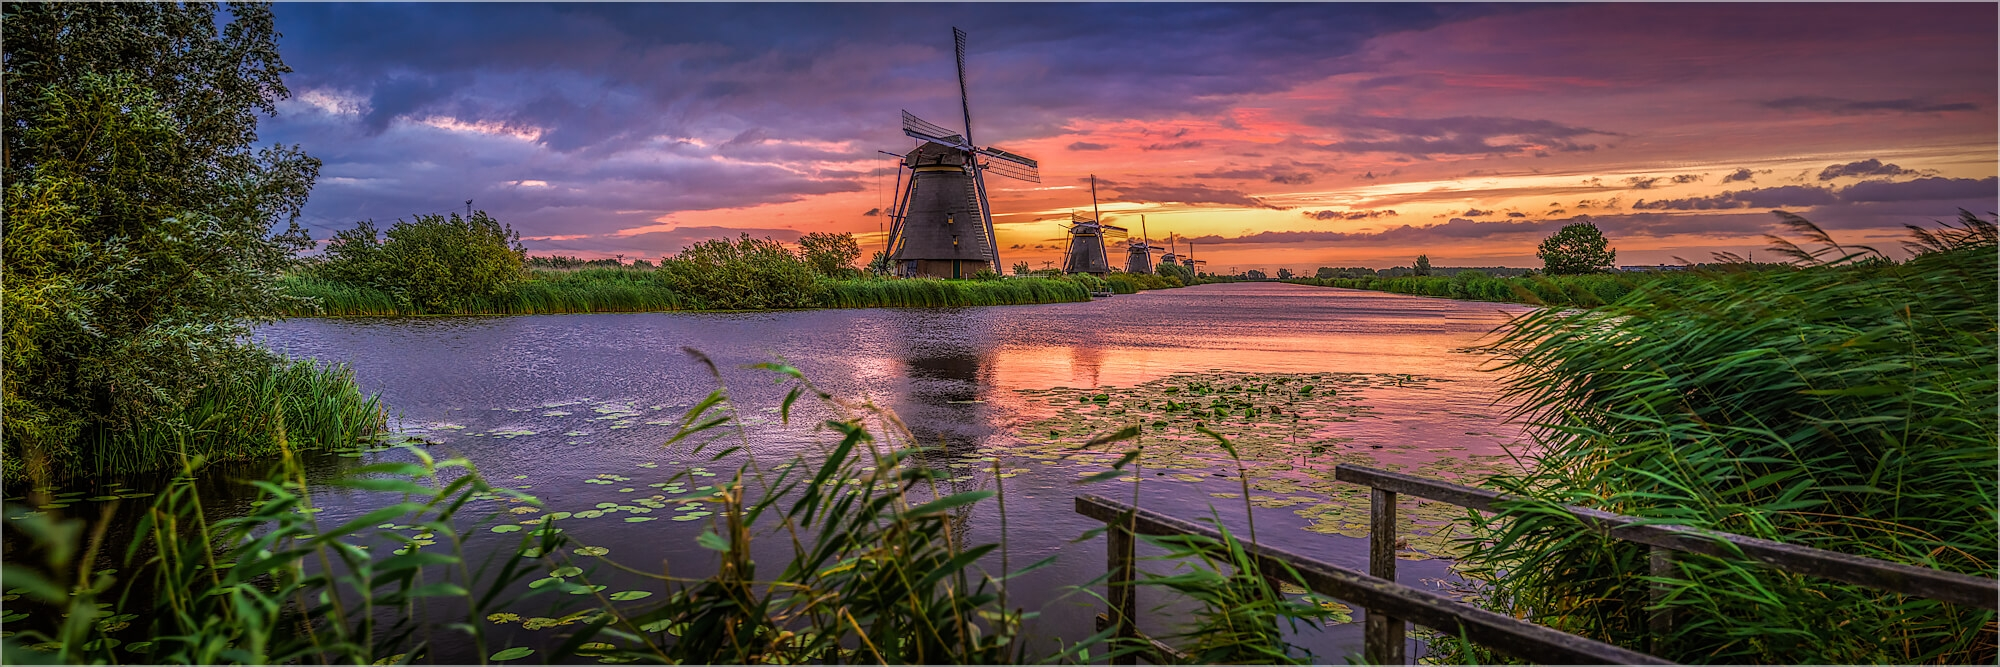 Panoramabild Windmühlen im Sonnenaufgang in Kinderdijk